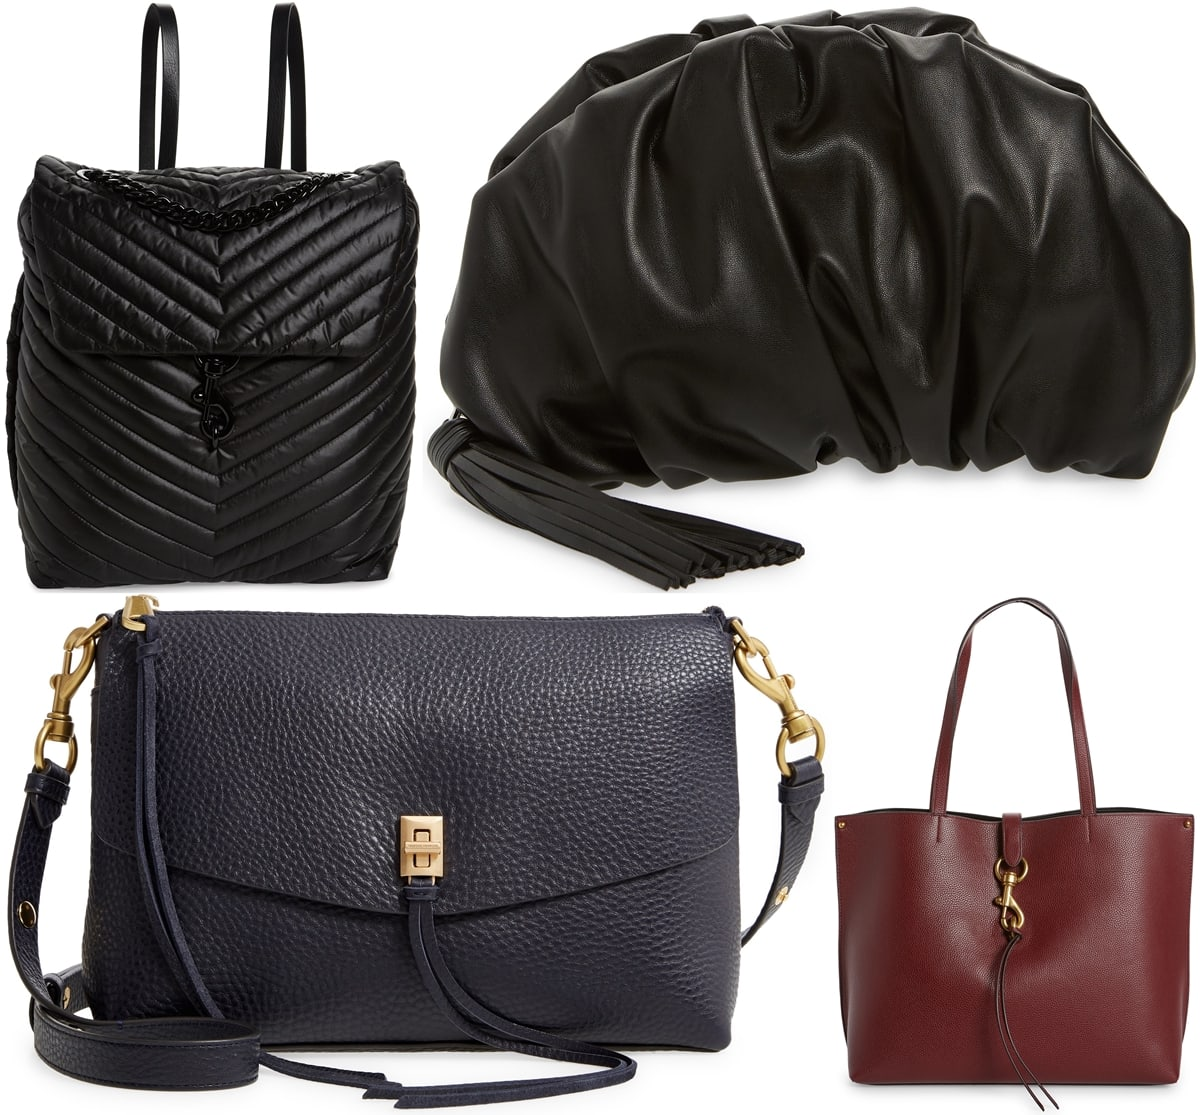 Rebecca Minkoff backpack, clutch, shoulder bag, and tote